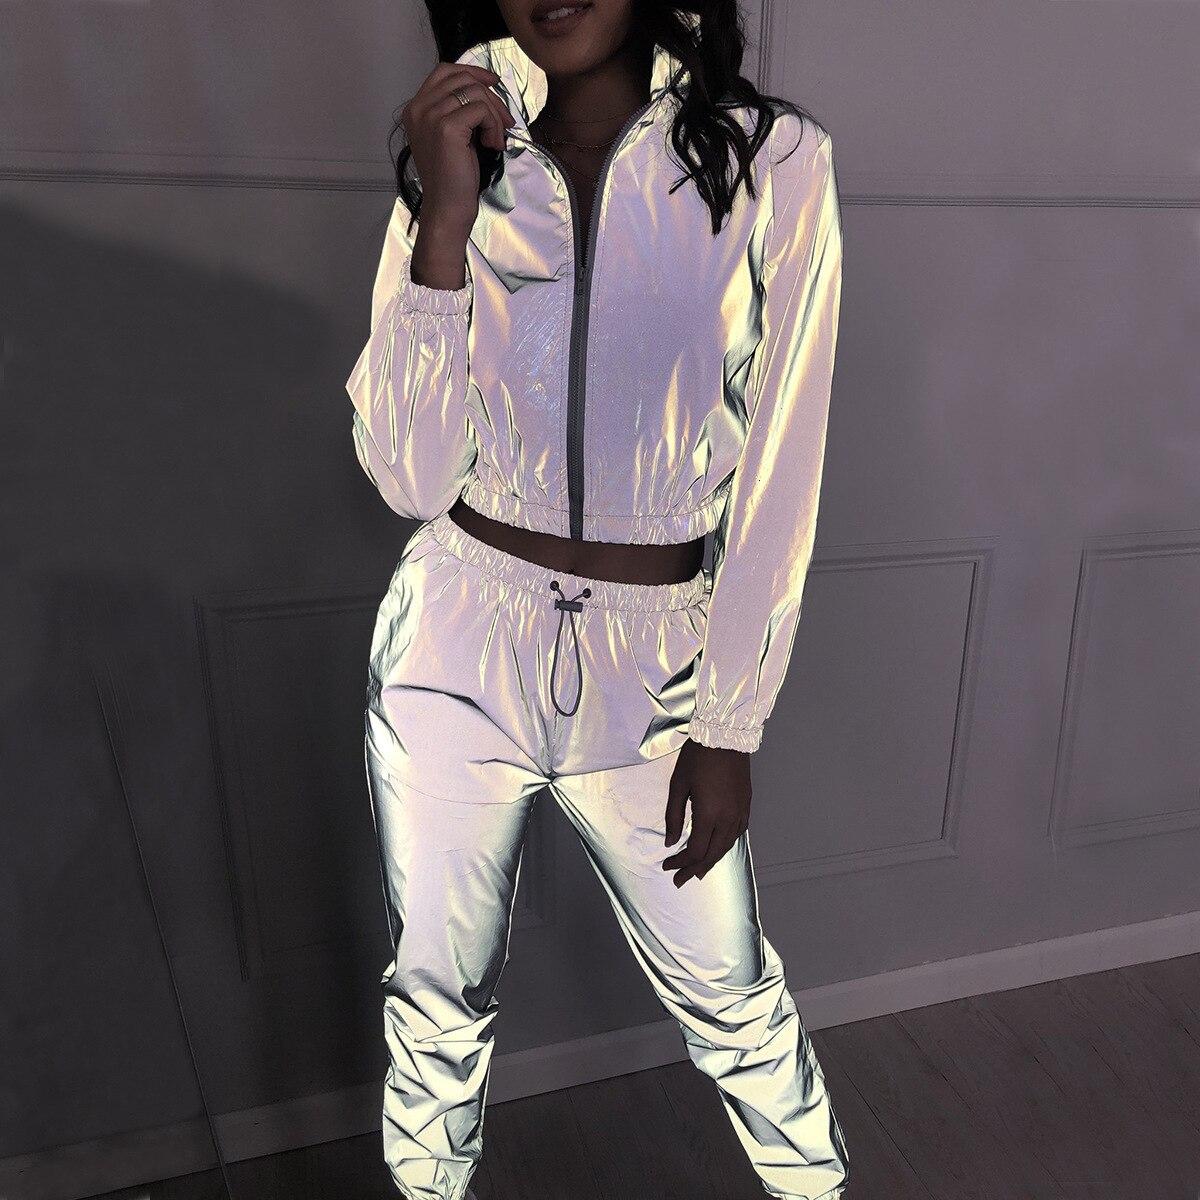 Glowing Jacket And Luminous Pants Fashion New Reflective Leisure Suit Two-piece Set